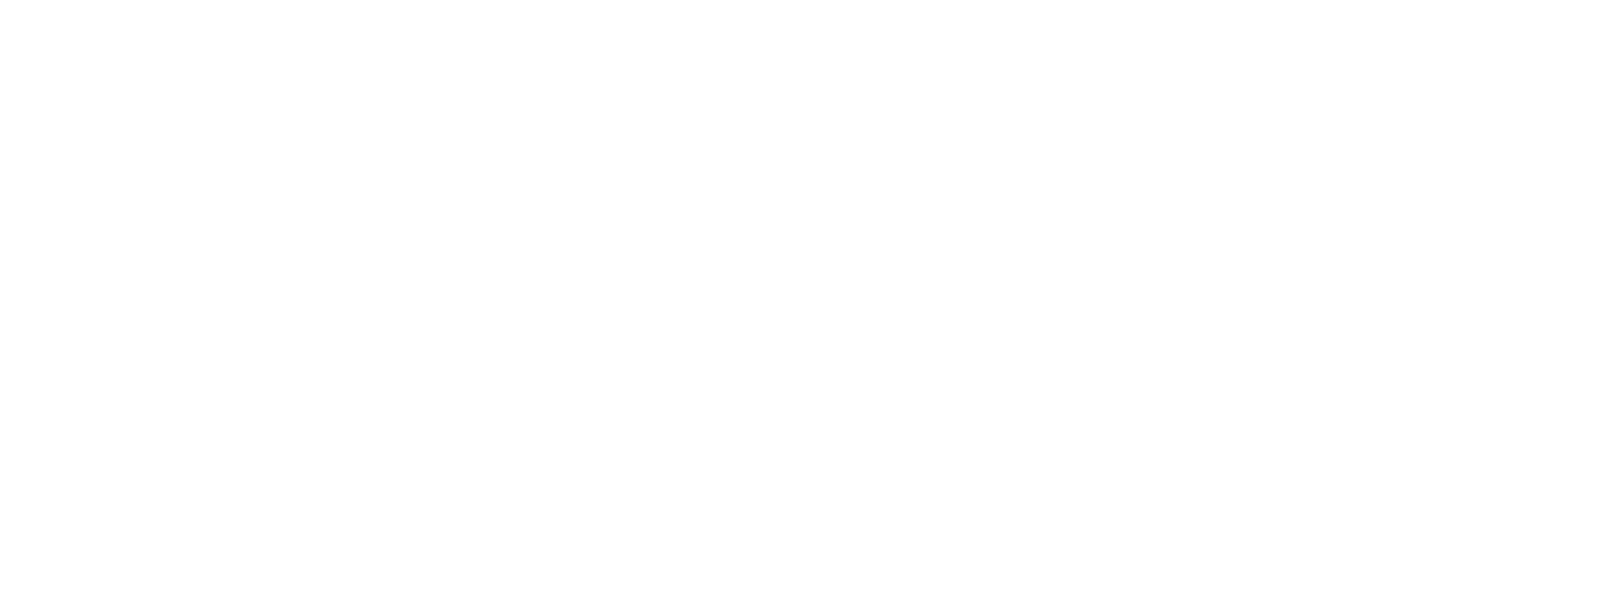 Master Sound/Vision HAW Hamburg